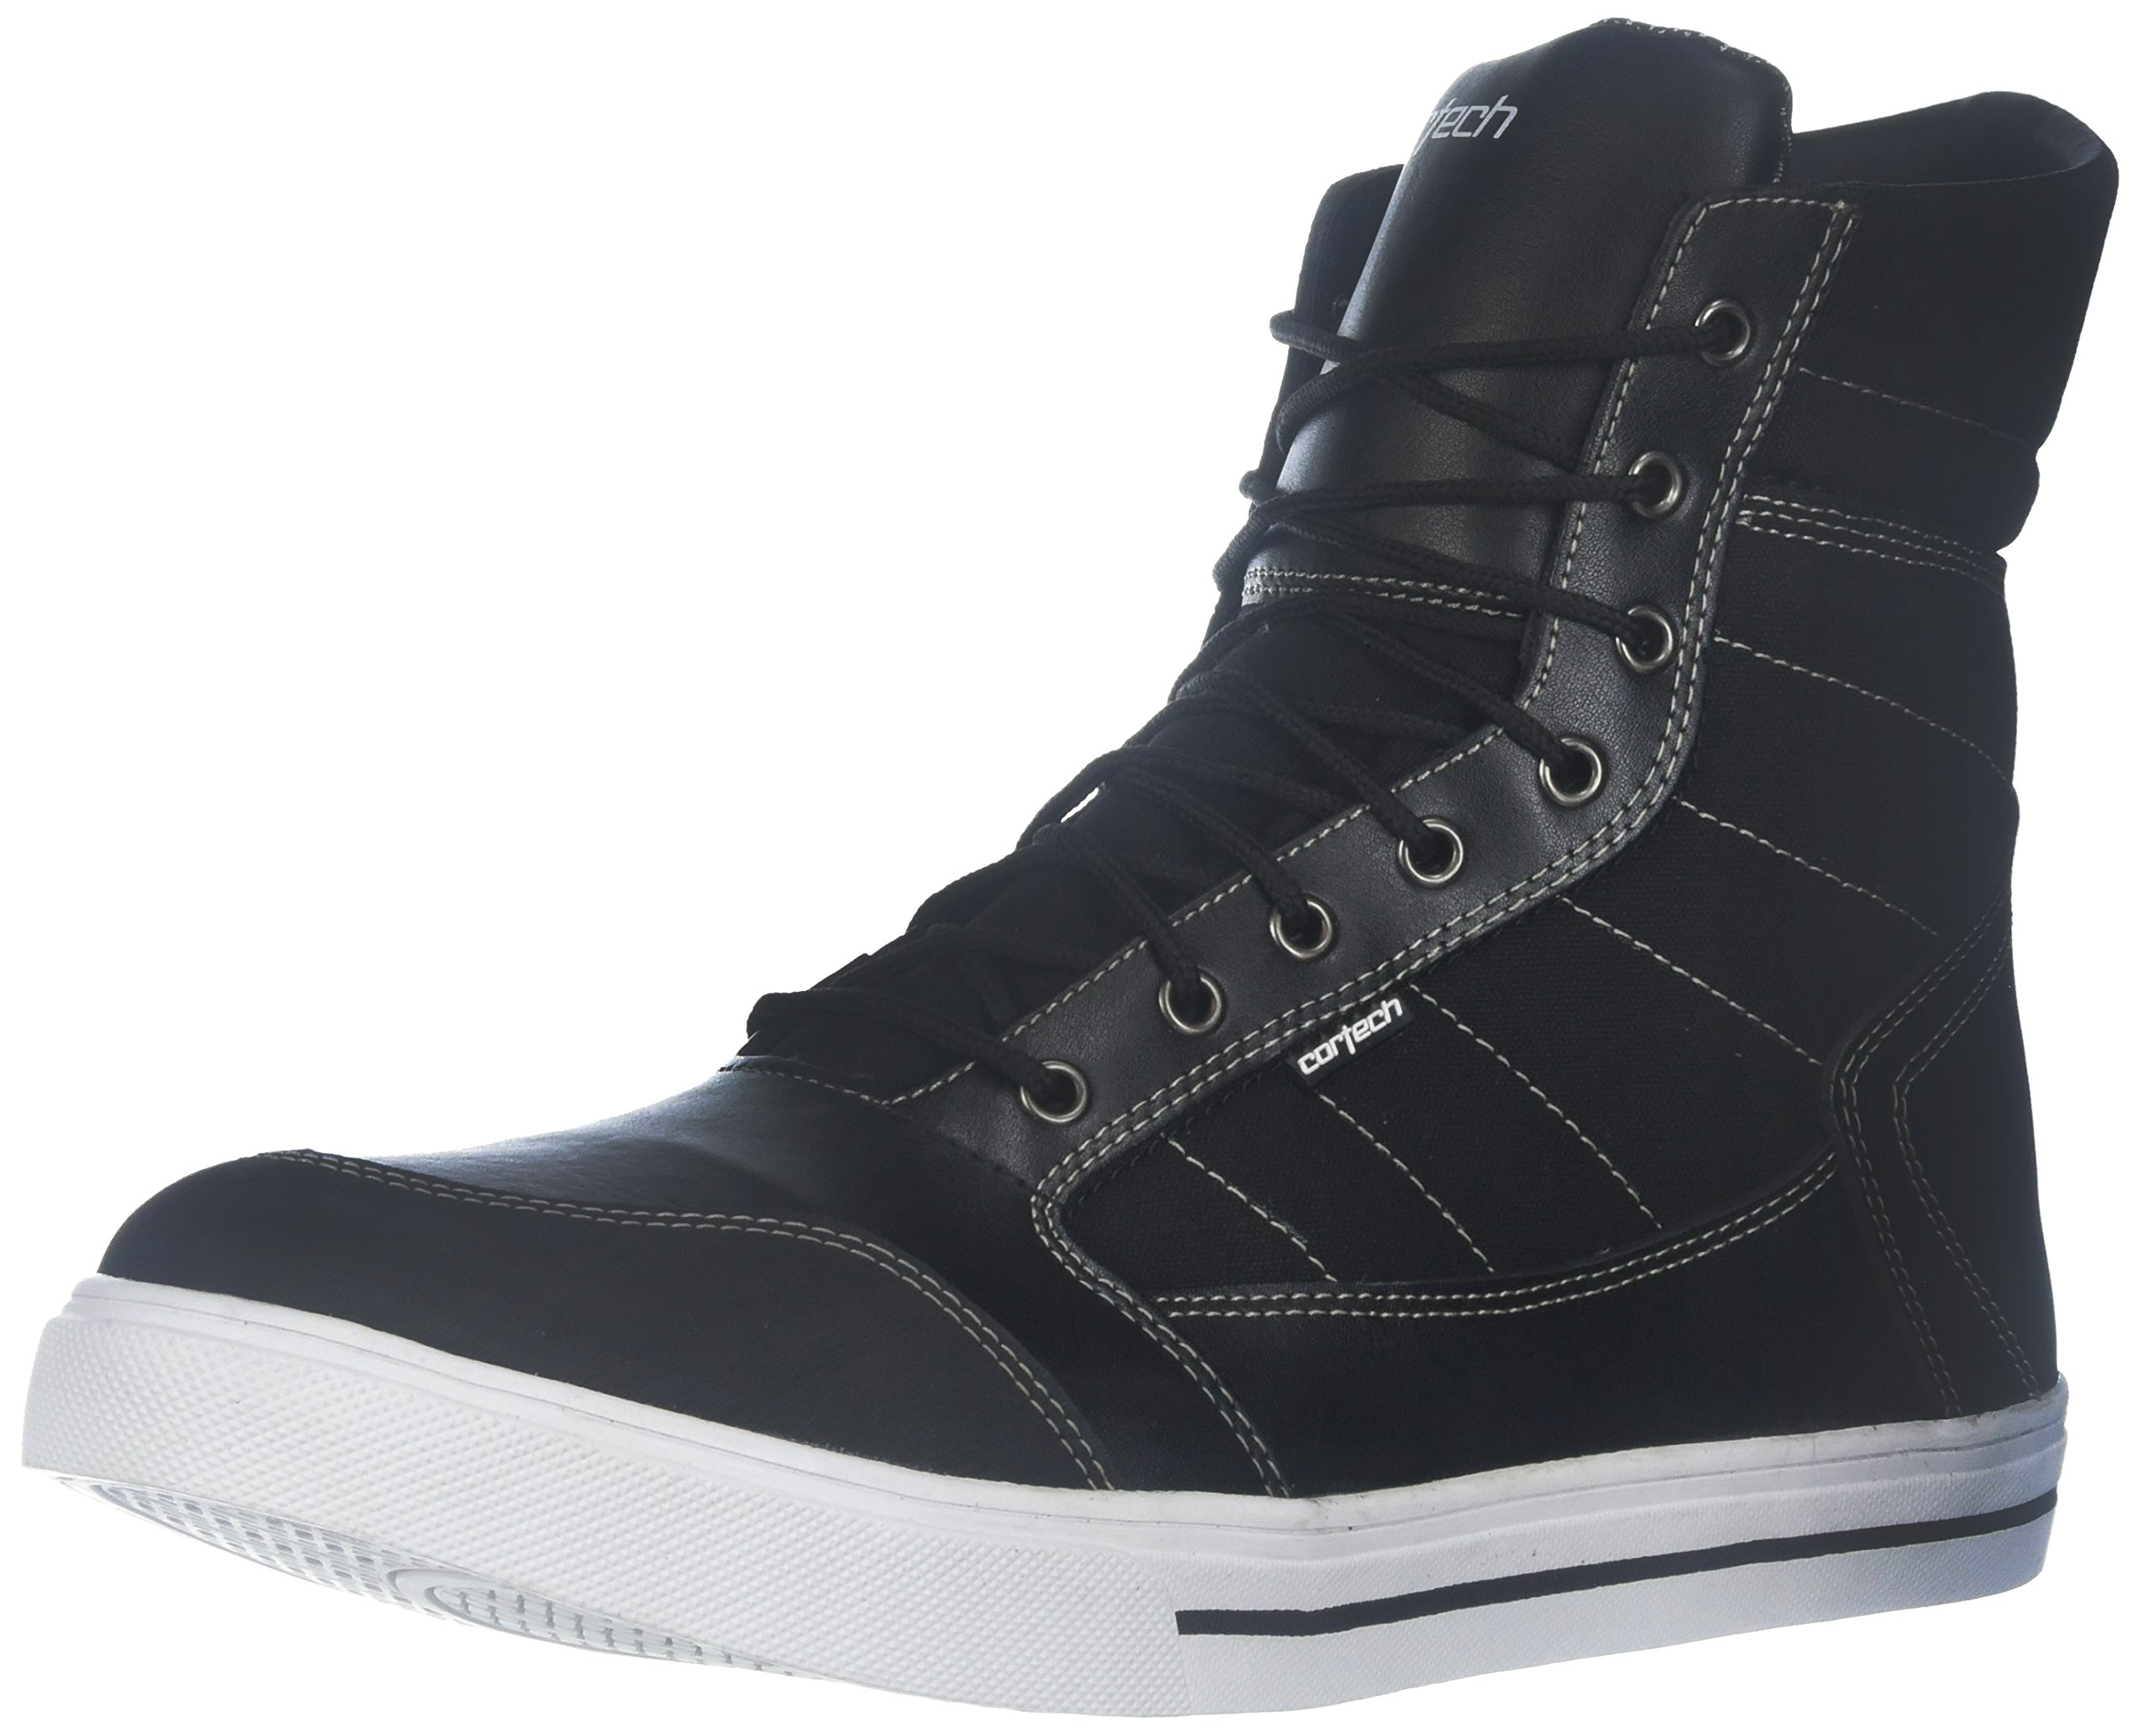 Cortech 8514-6505-46 Men's Vice WP Riding Shoe(White/Black, Size 12), 1 Pack